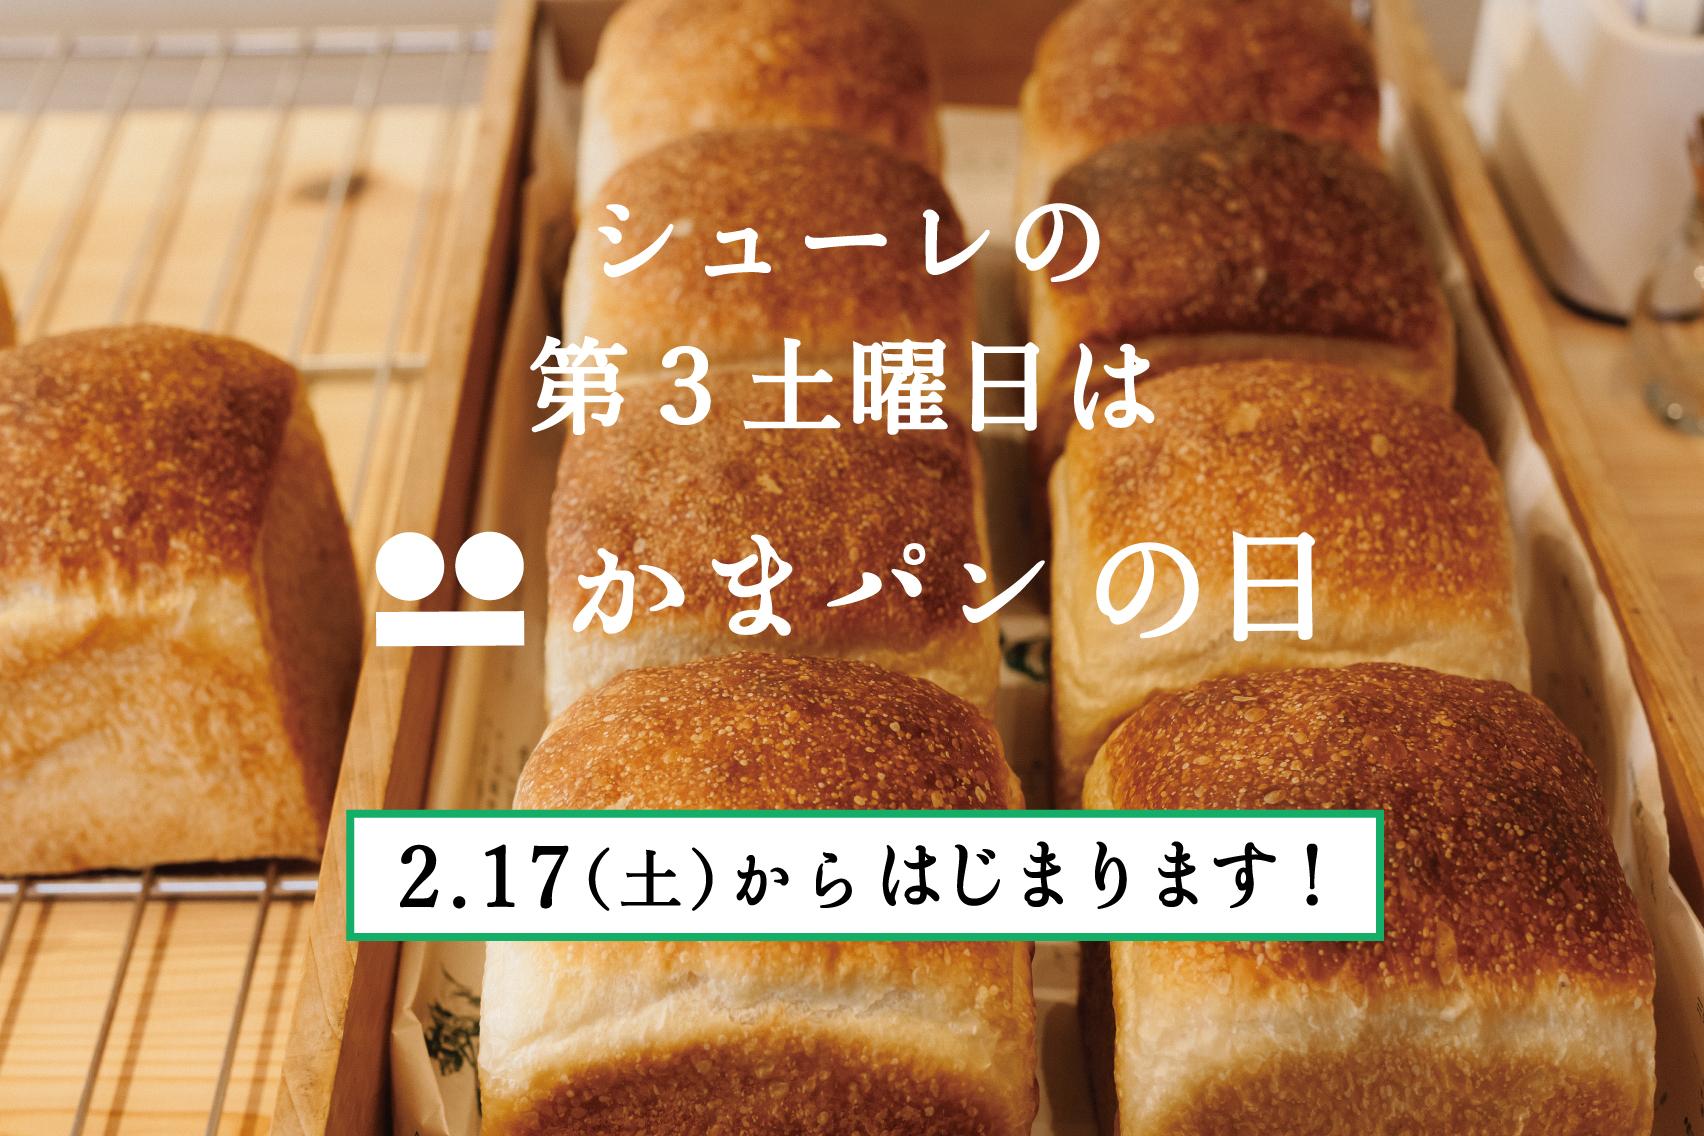 http://www.schule.jp/news/kamapanhanbai_schule.jpg